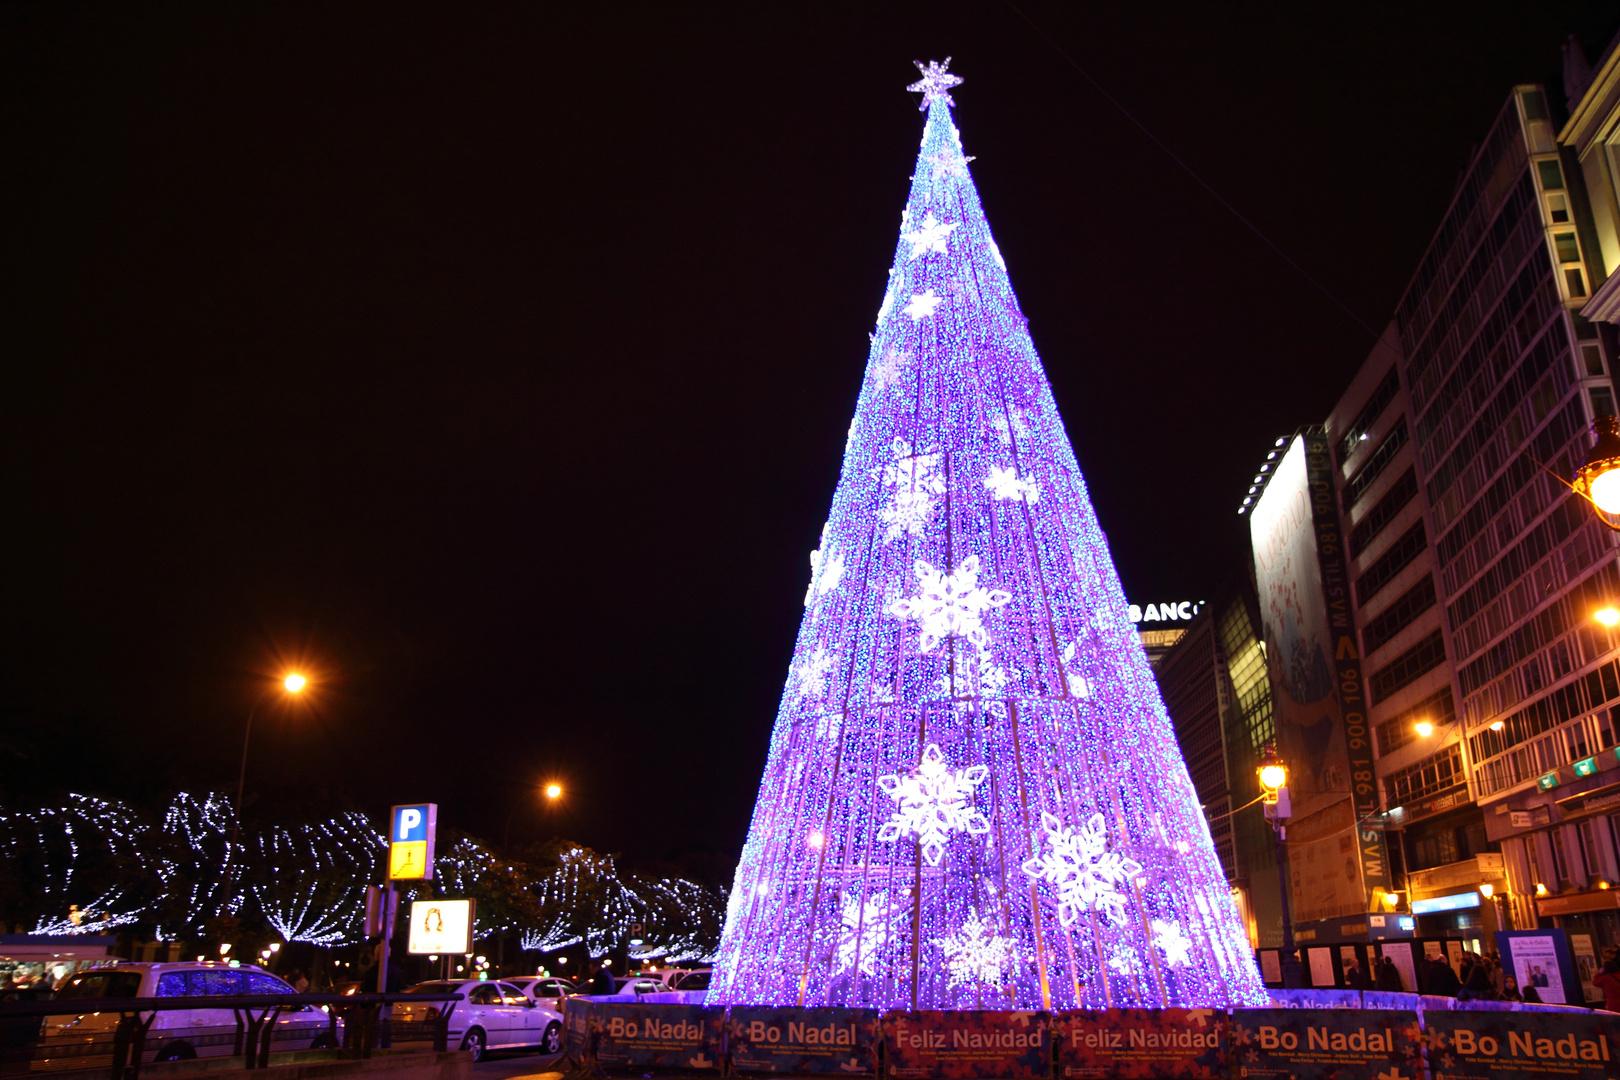 Arbol de Navidad moderno (Obelisco, A Coruña)